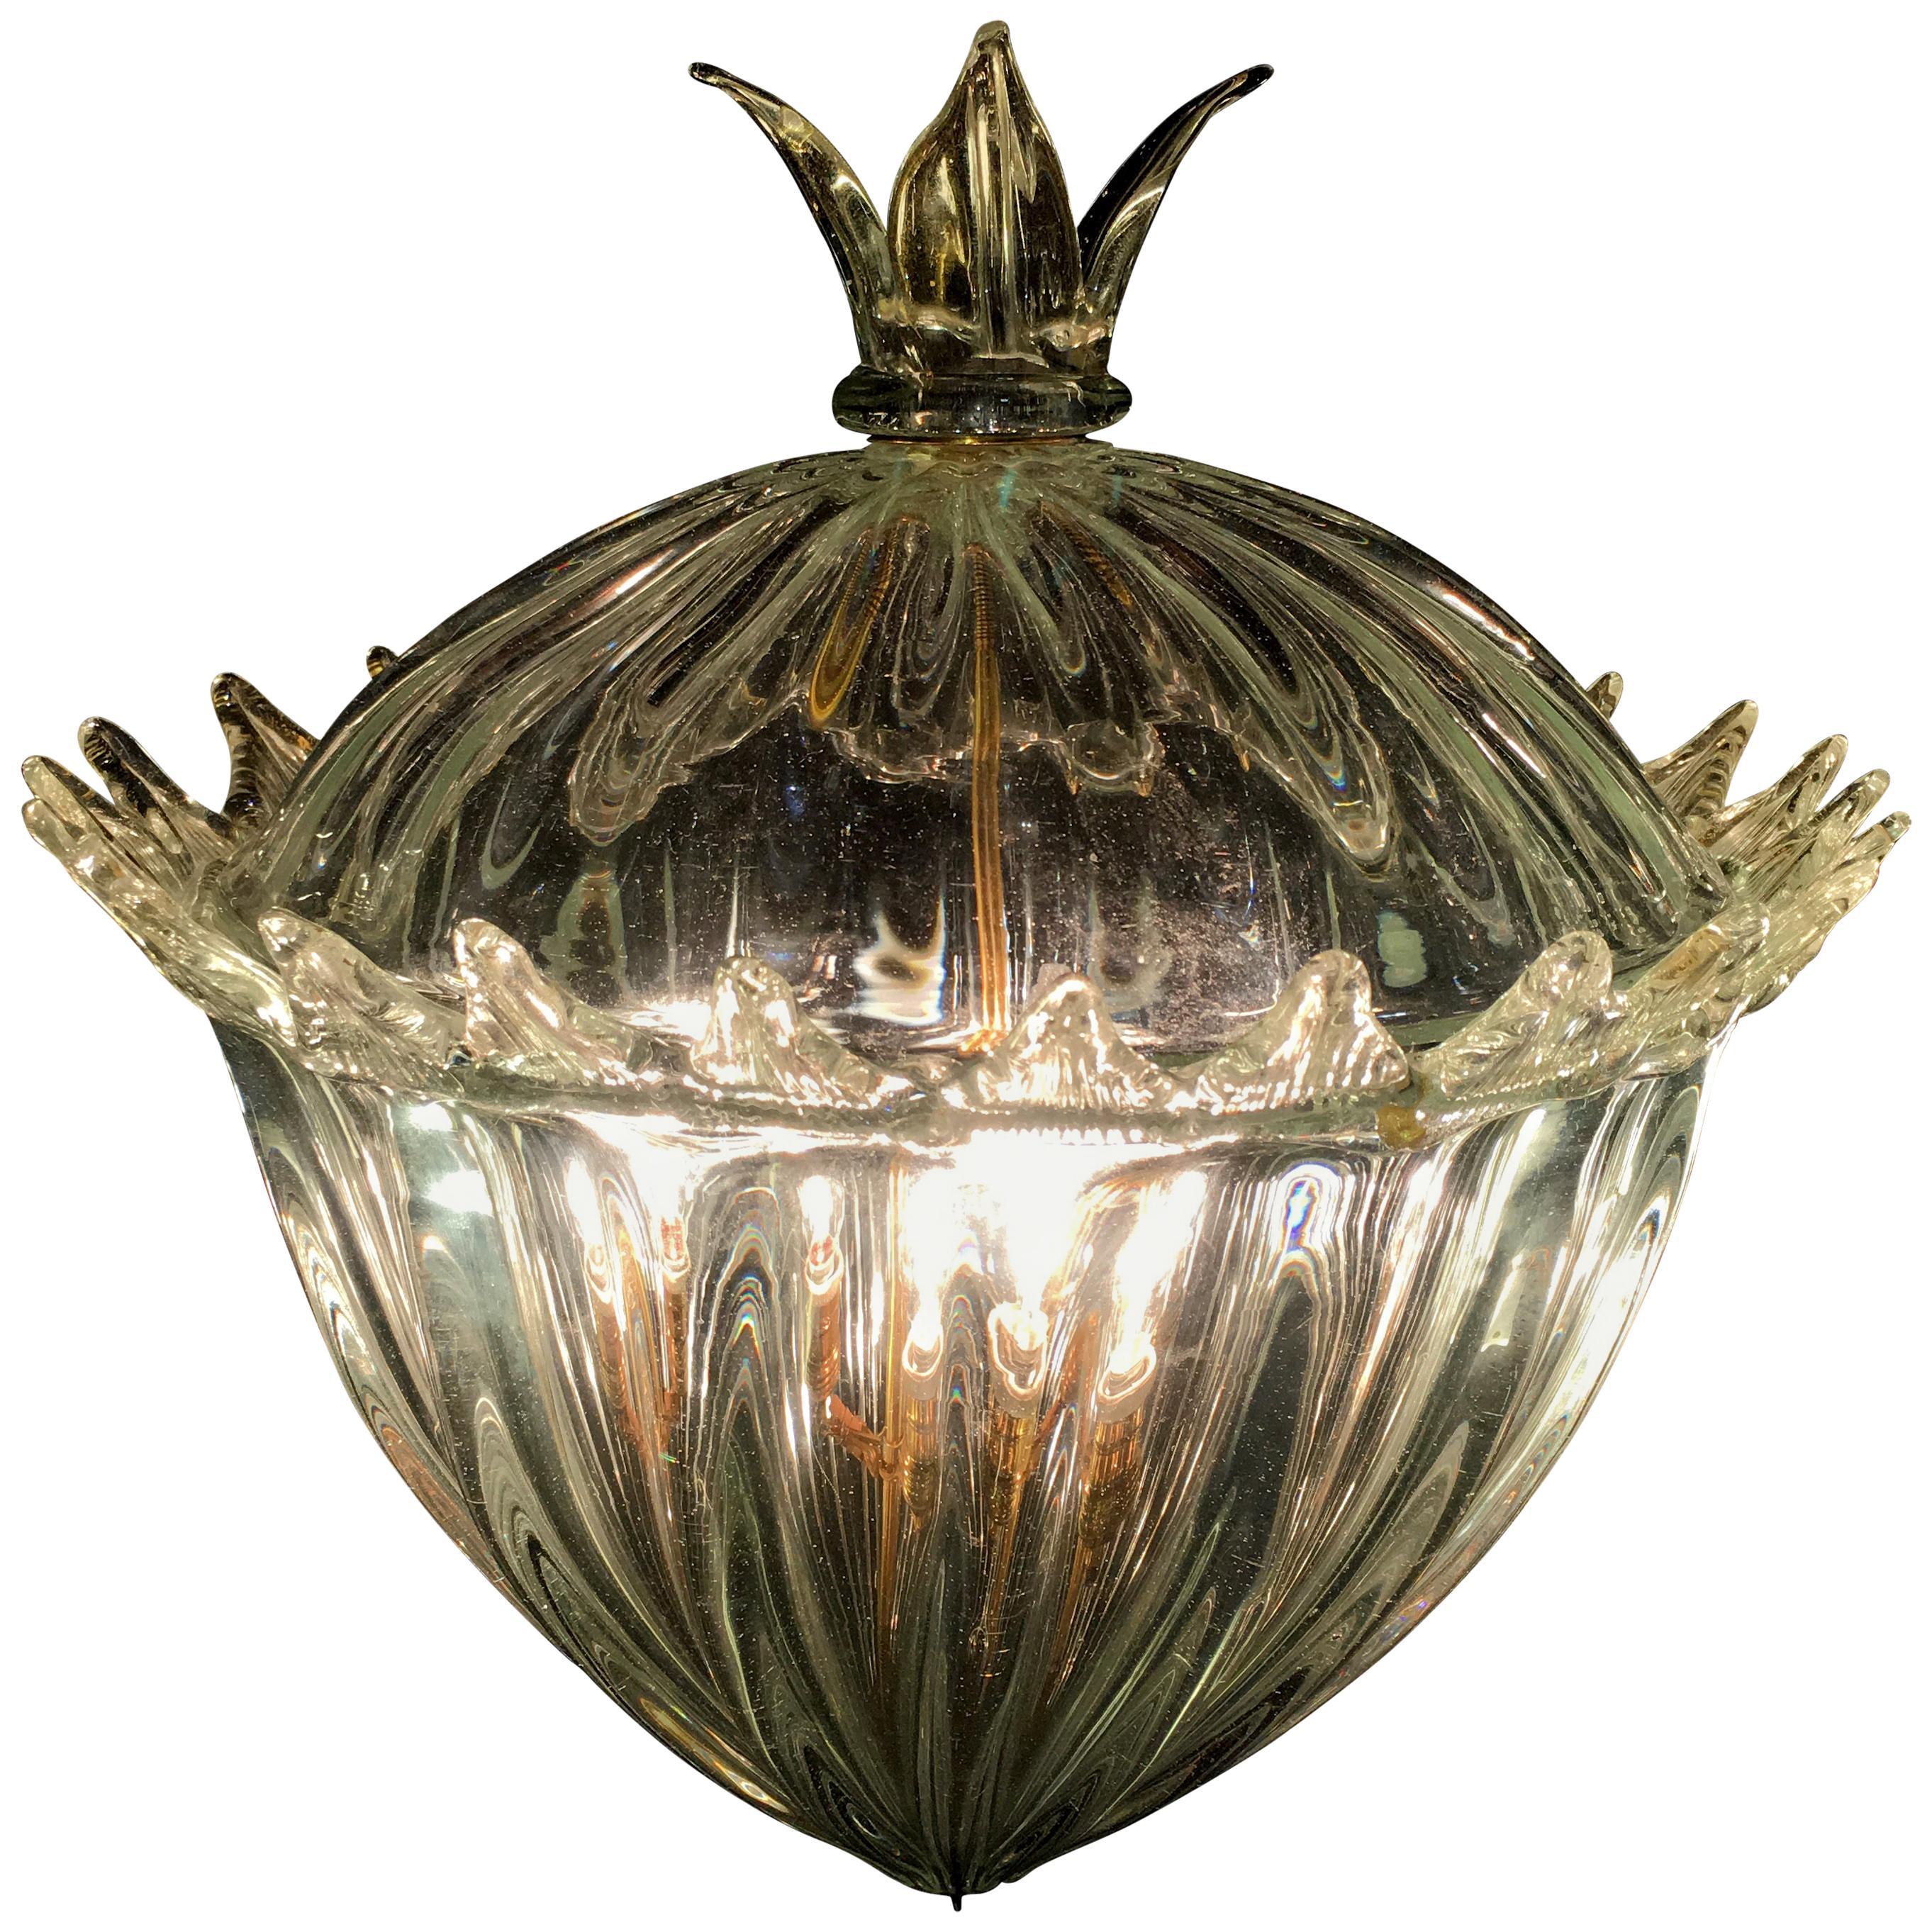 Chandelier Lantern U0026quot;The Queen Motheru0026quot; By Barovier U0026amp; Toso.